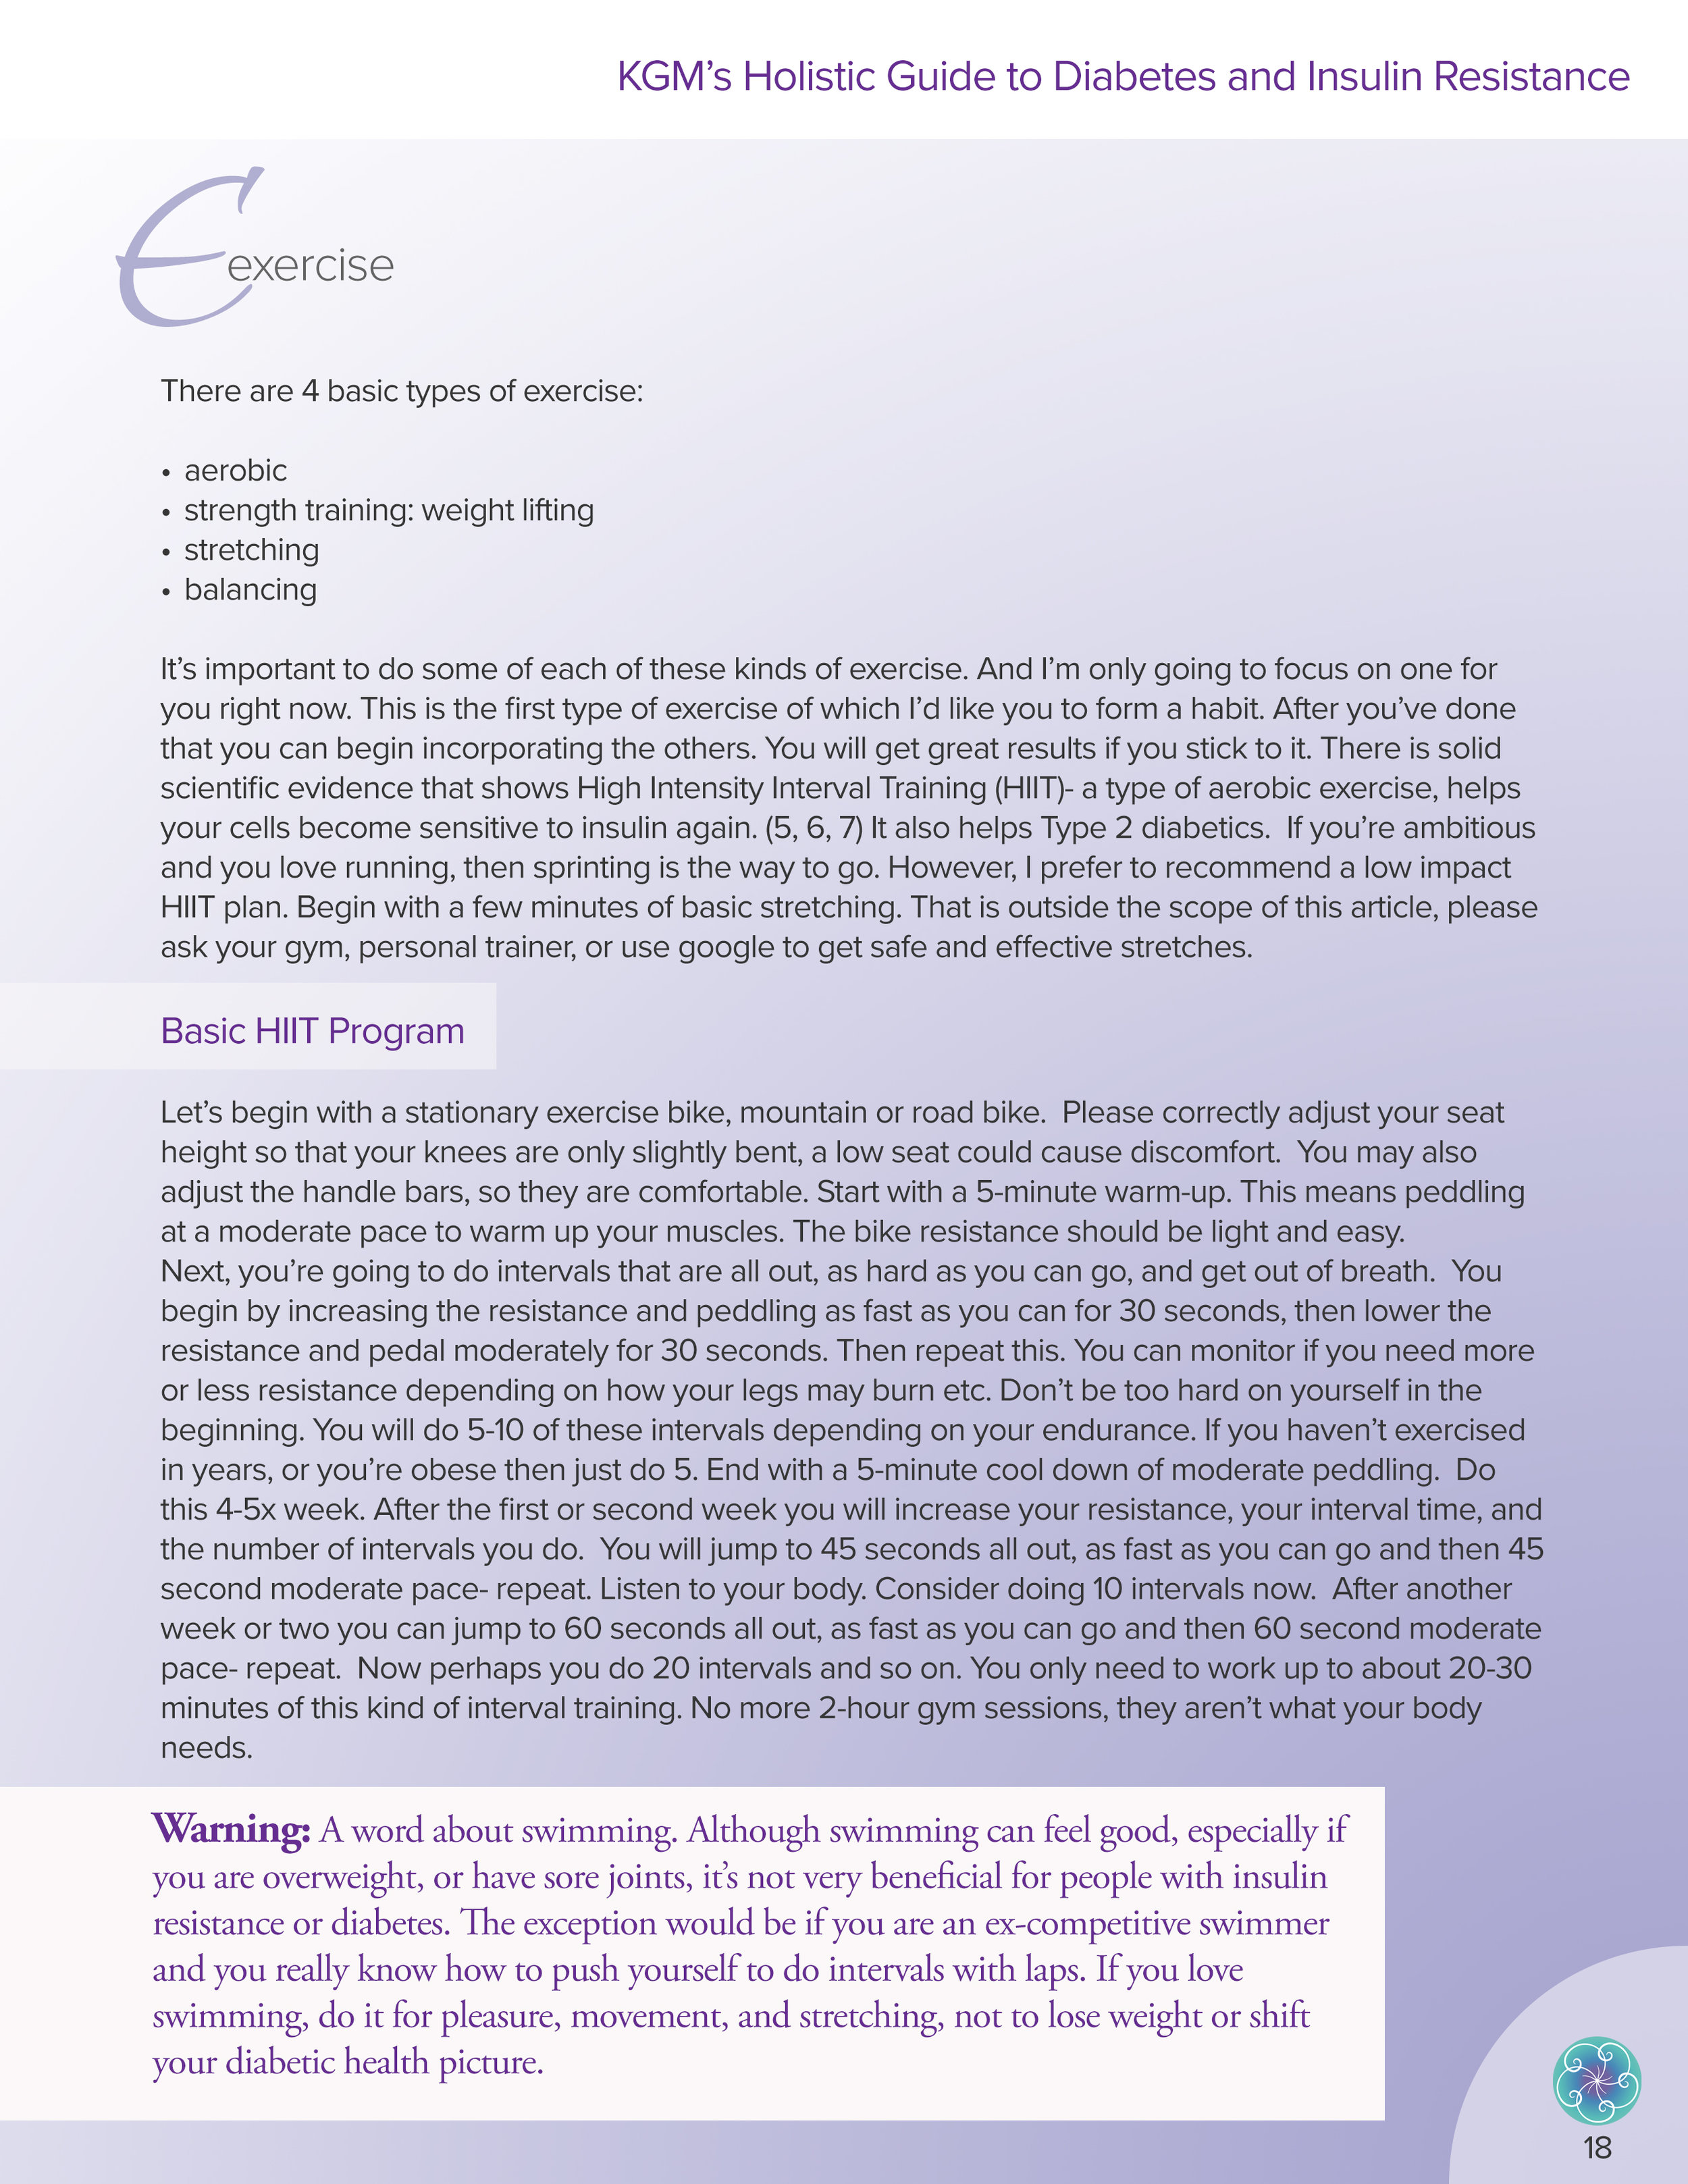 KGM_Insulin_Page18.jpg